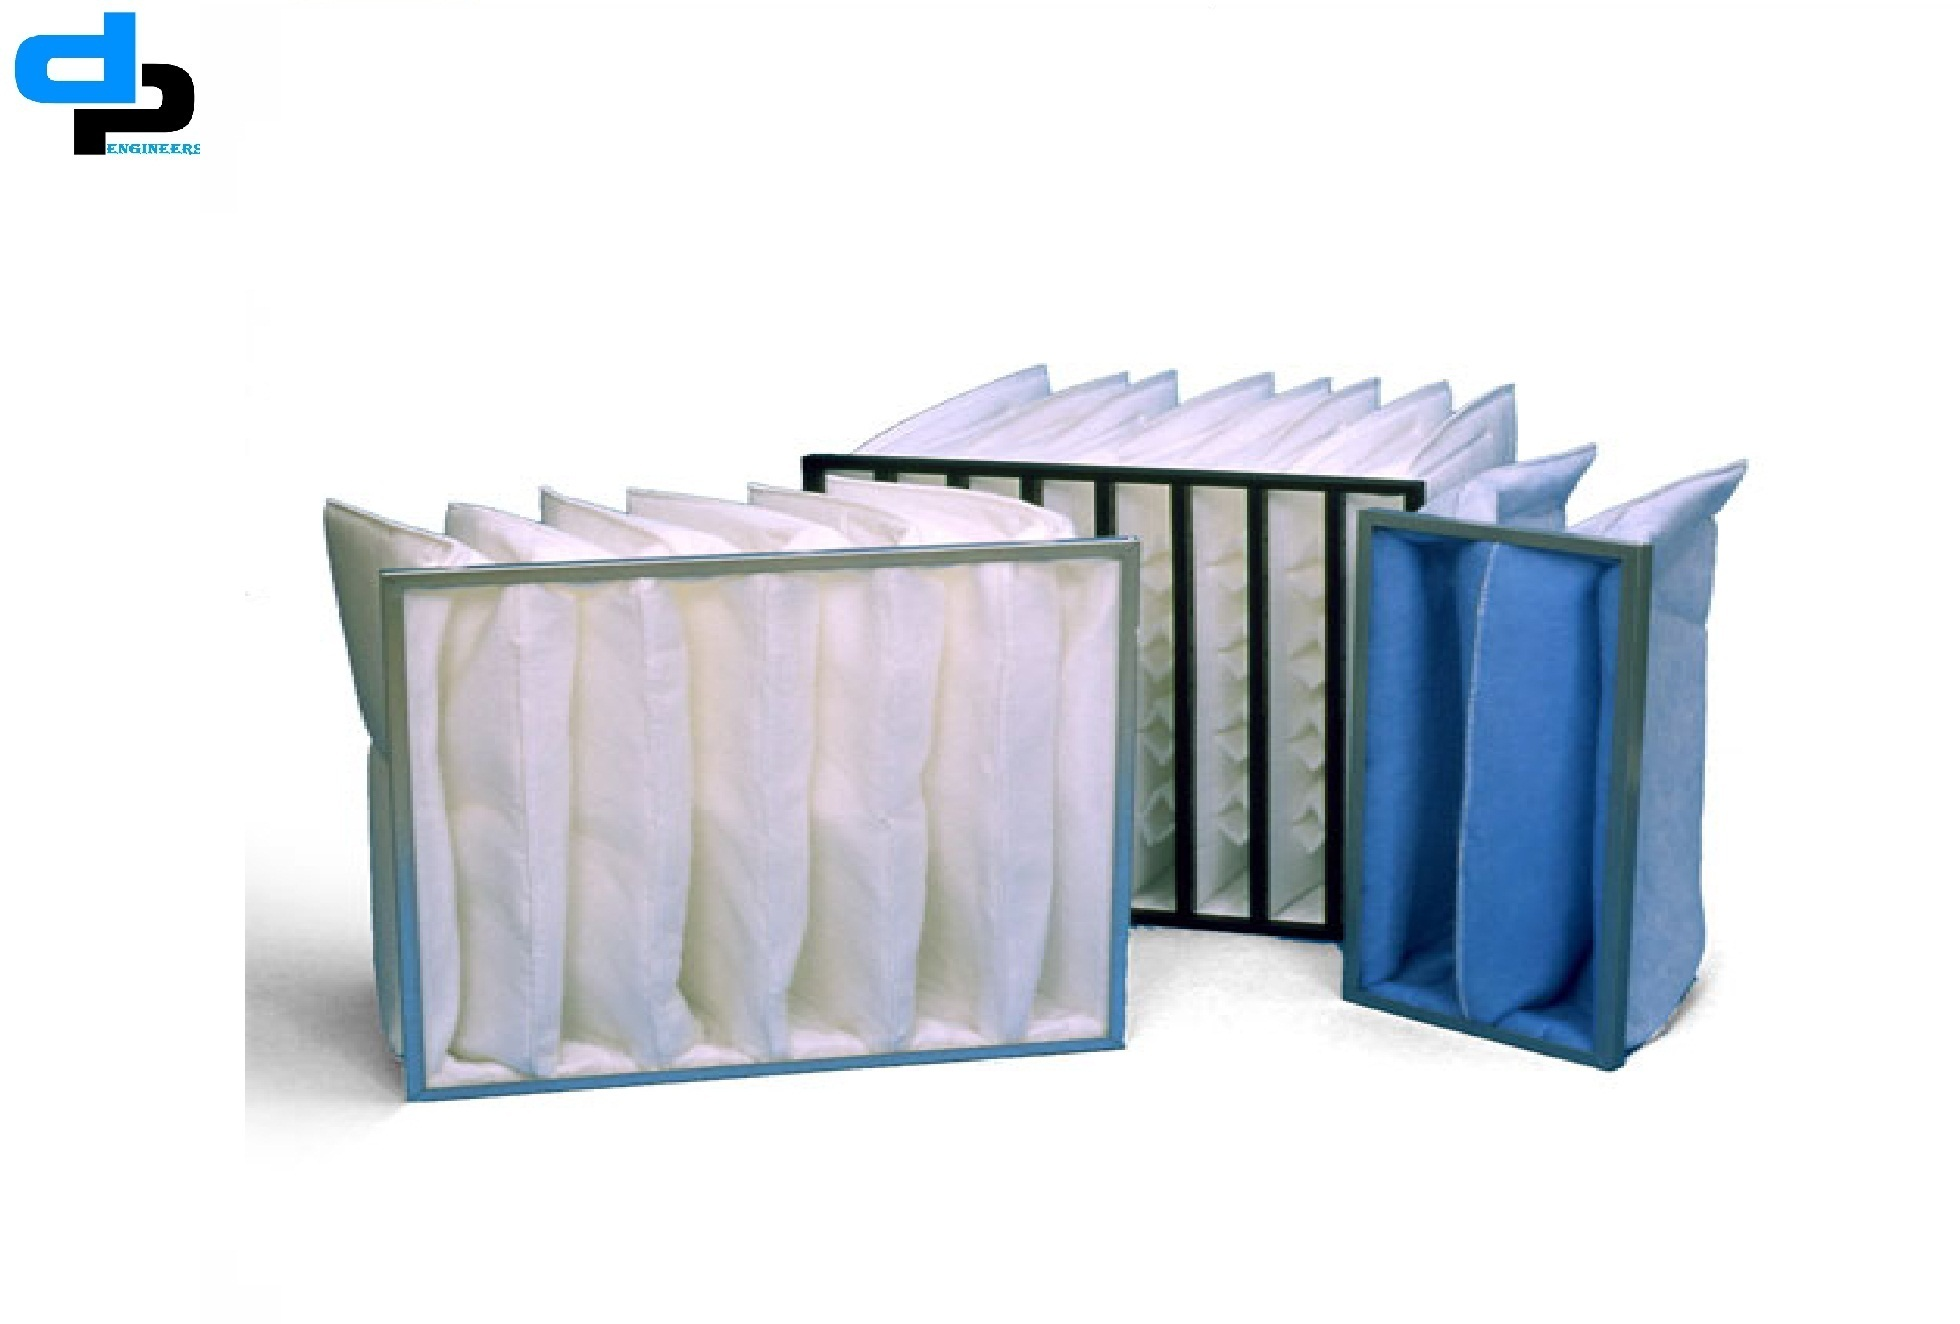 Primary Pocket Filter